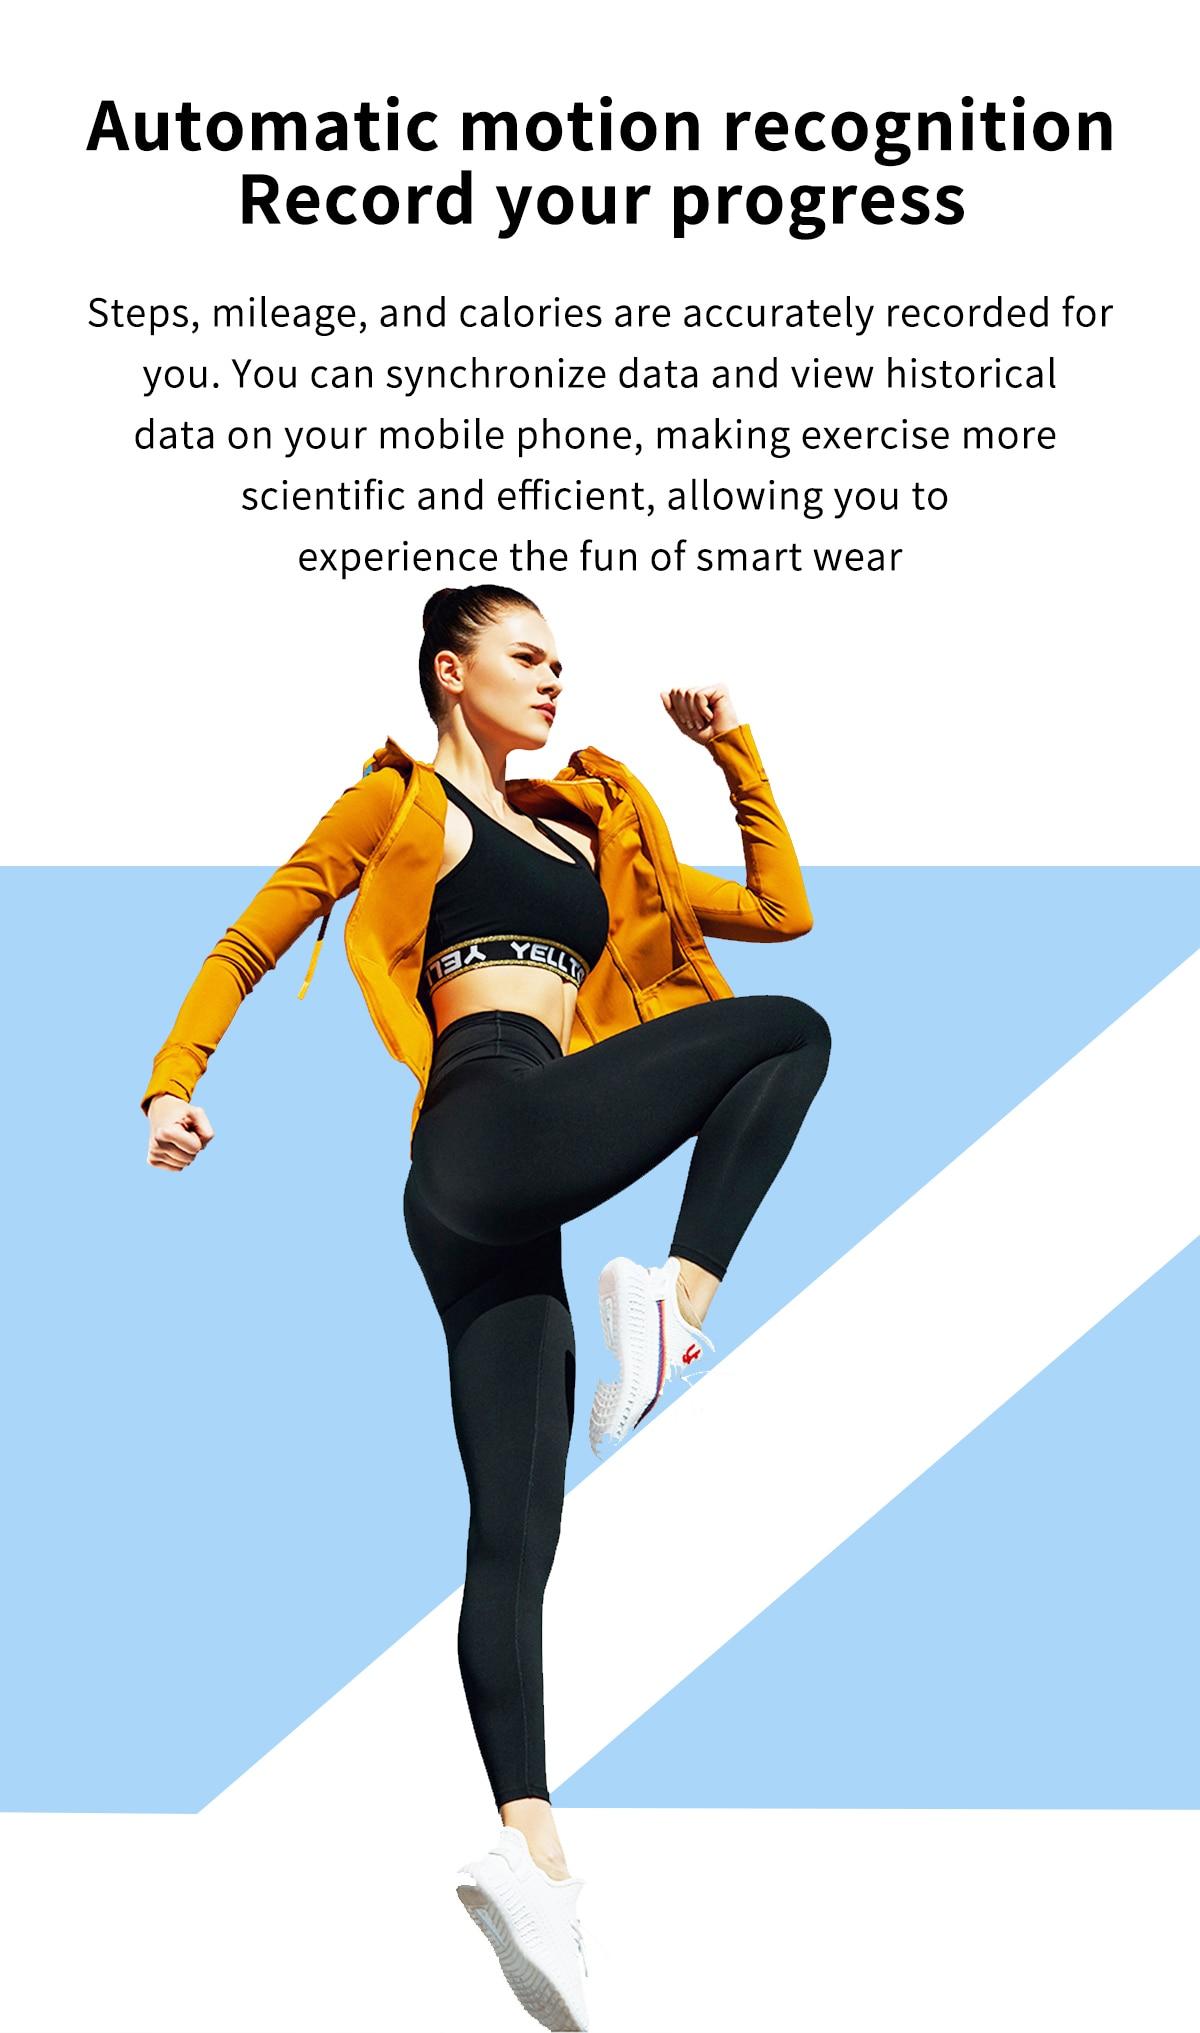 H5cec105af47545e4aacb69d331f623ddp LIGE 2021 Fashion Smart Watch Men Fitness Bracelet Heart Rate Blood Pressure Monitoring Sports Tracker Smartwatch Gift for Women